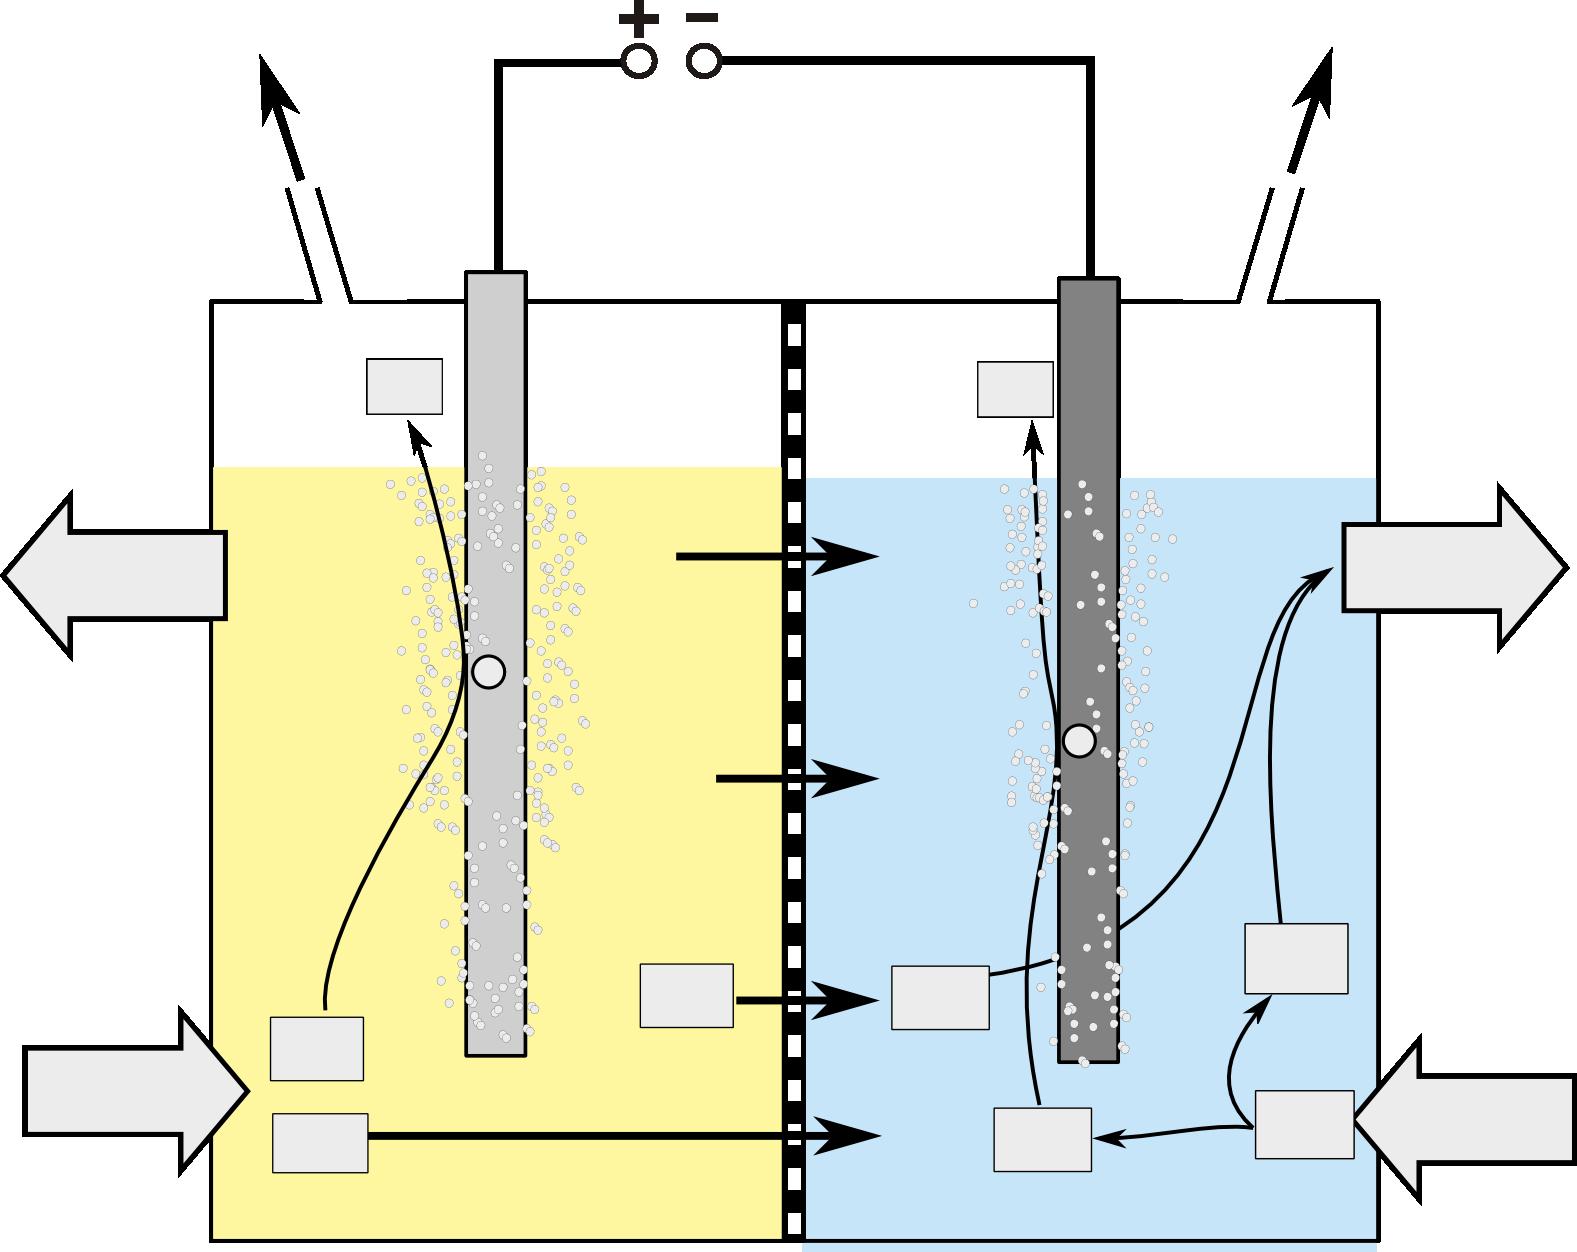 Das modernere Membran-Verfahren